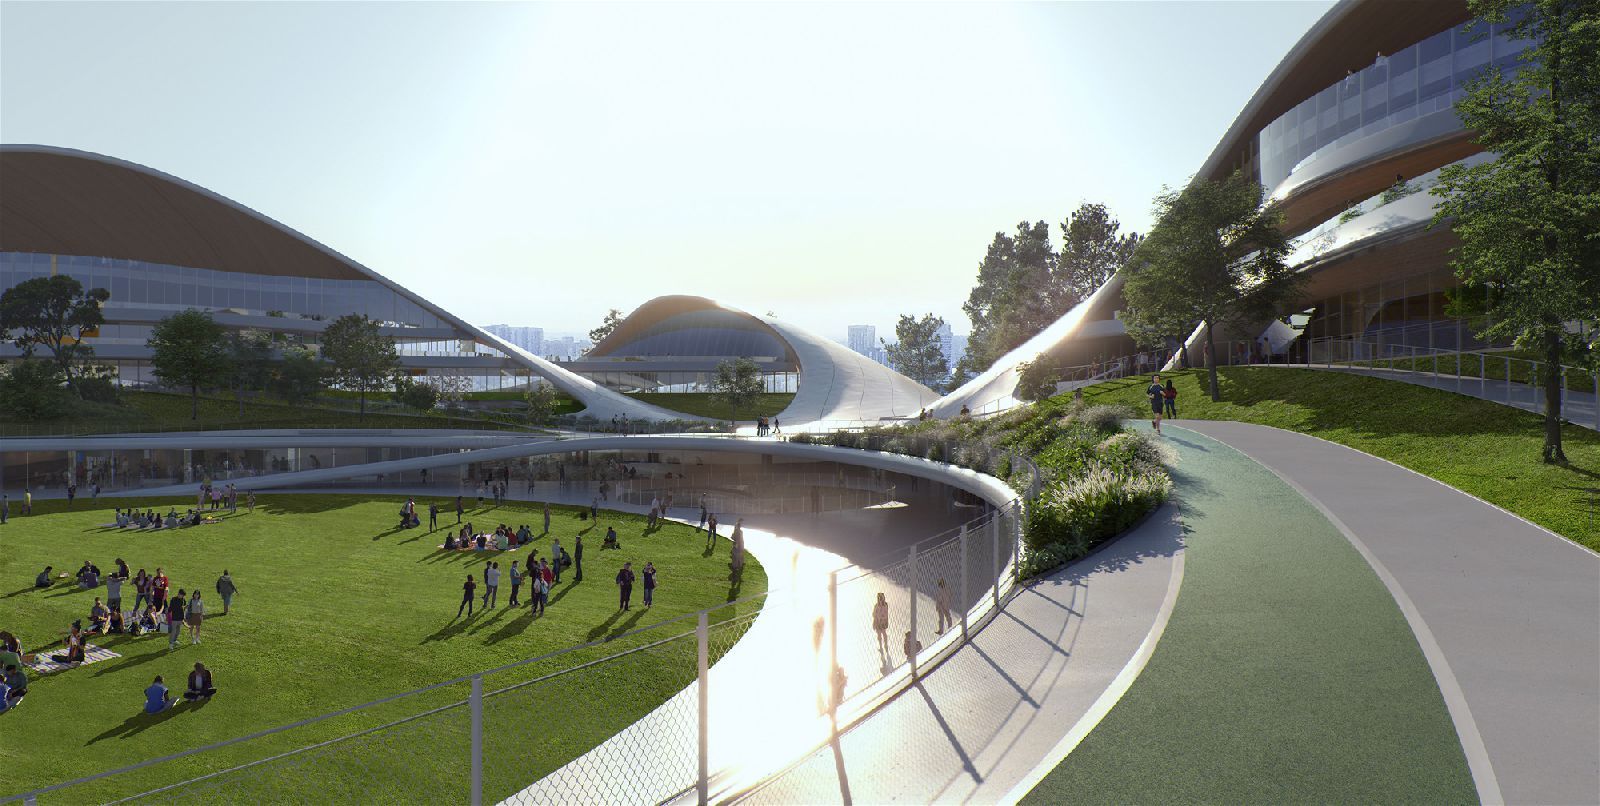 Jiaxing Civic Center